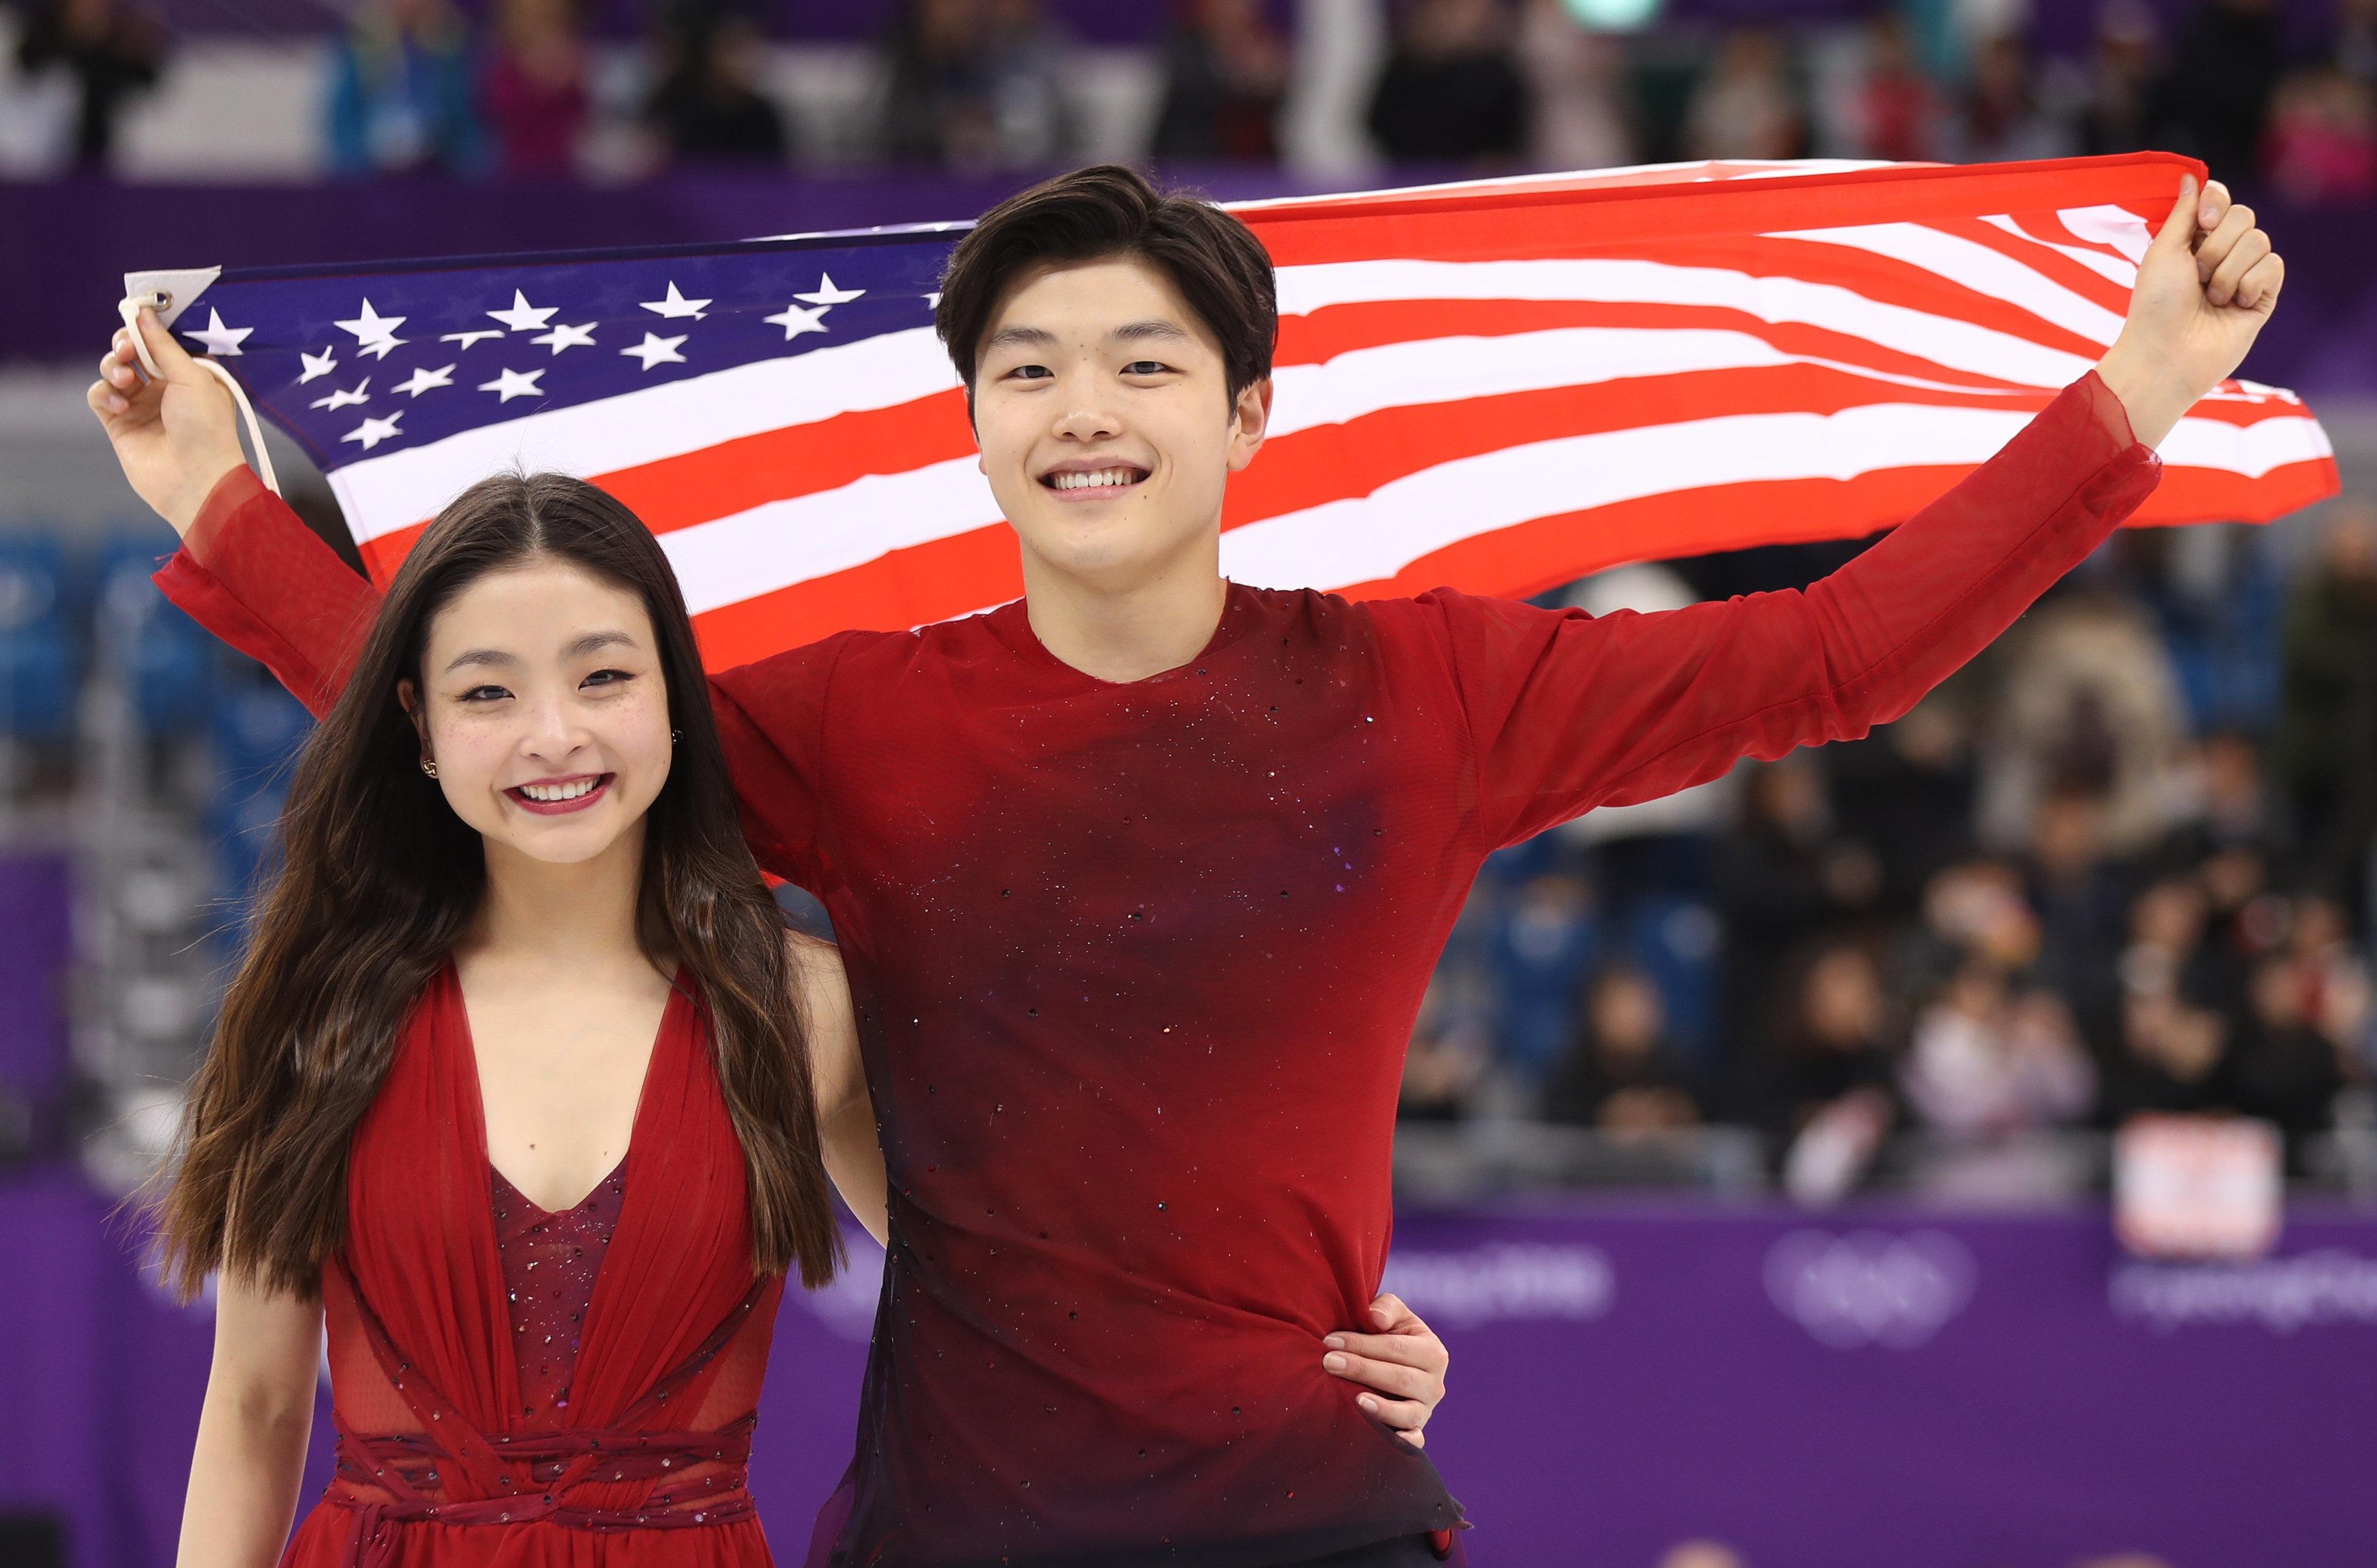 Figure Skating - Pyeongchang 2018 Winter Olympics - Ice Dance free dance competition final - Gangneung, South Korea - February 20, 2018 - Bronze medallists Maia Shibutani and Alex Shibutani of the U.S. celebrate. REUTERS/Lucy Nicholson